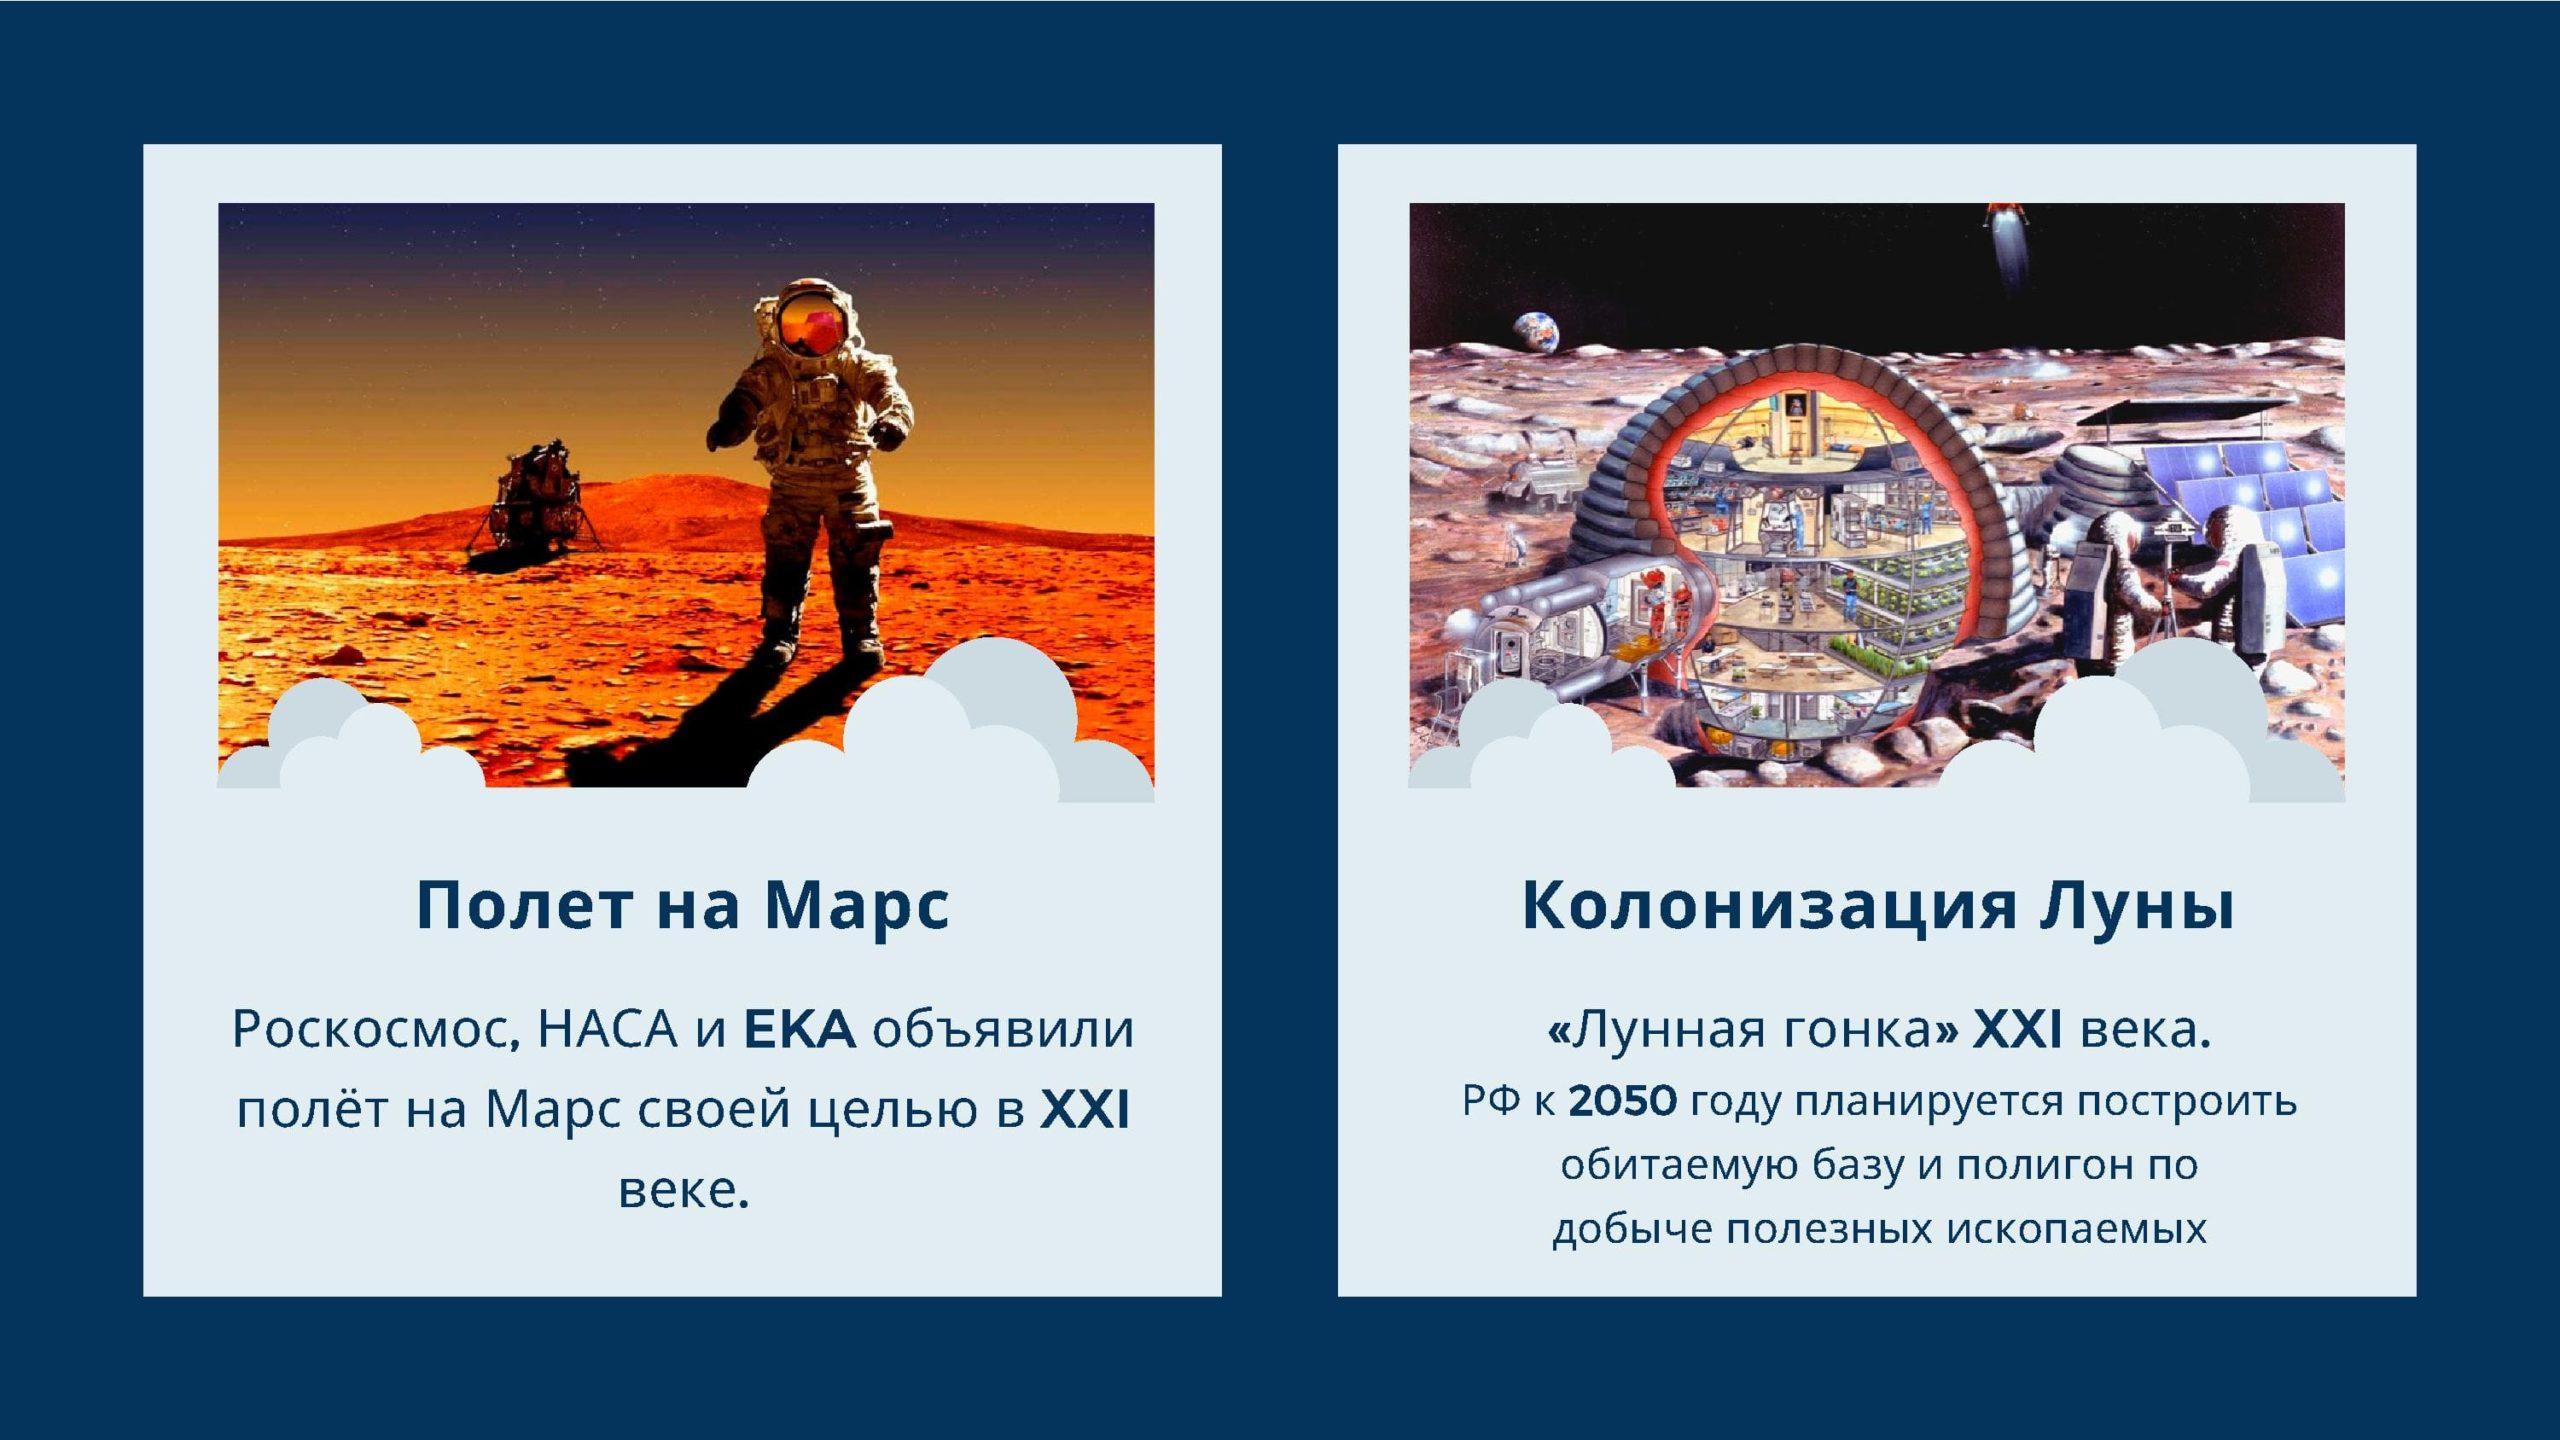 Полёт на Марс. Колонизация Луны